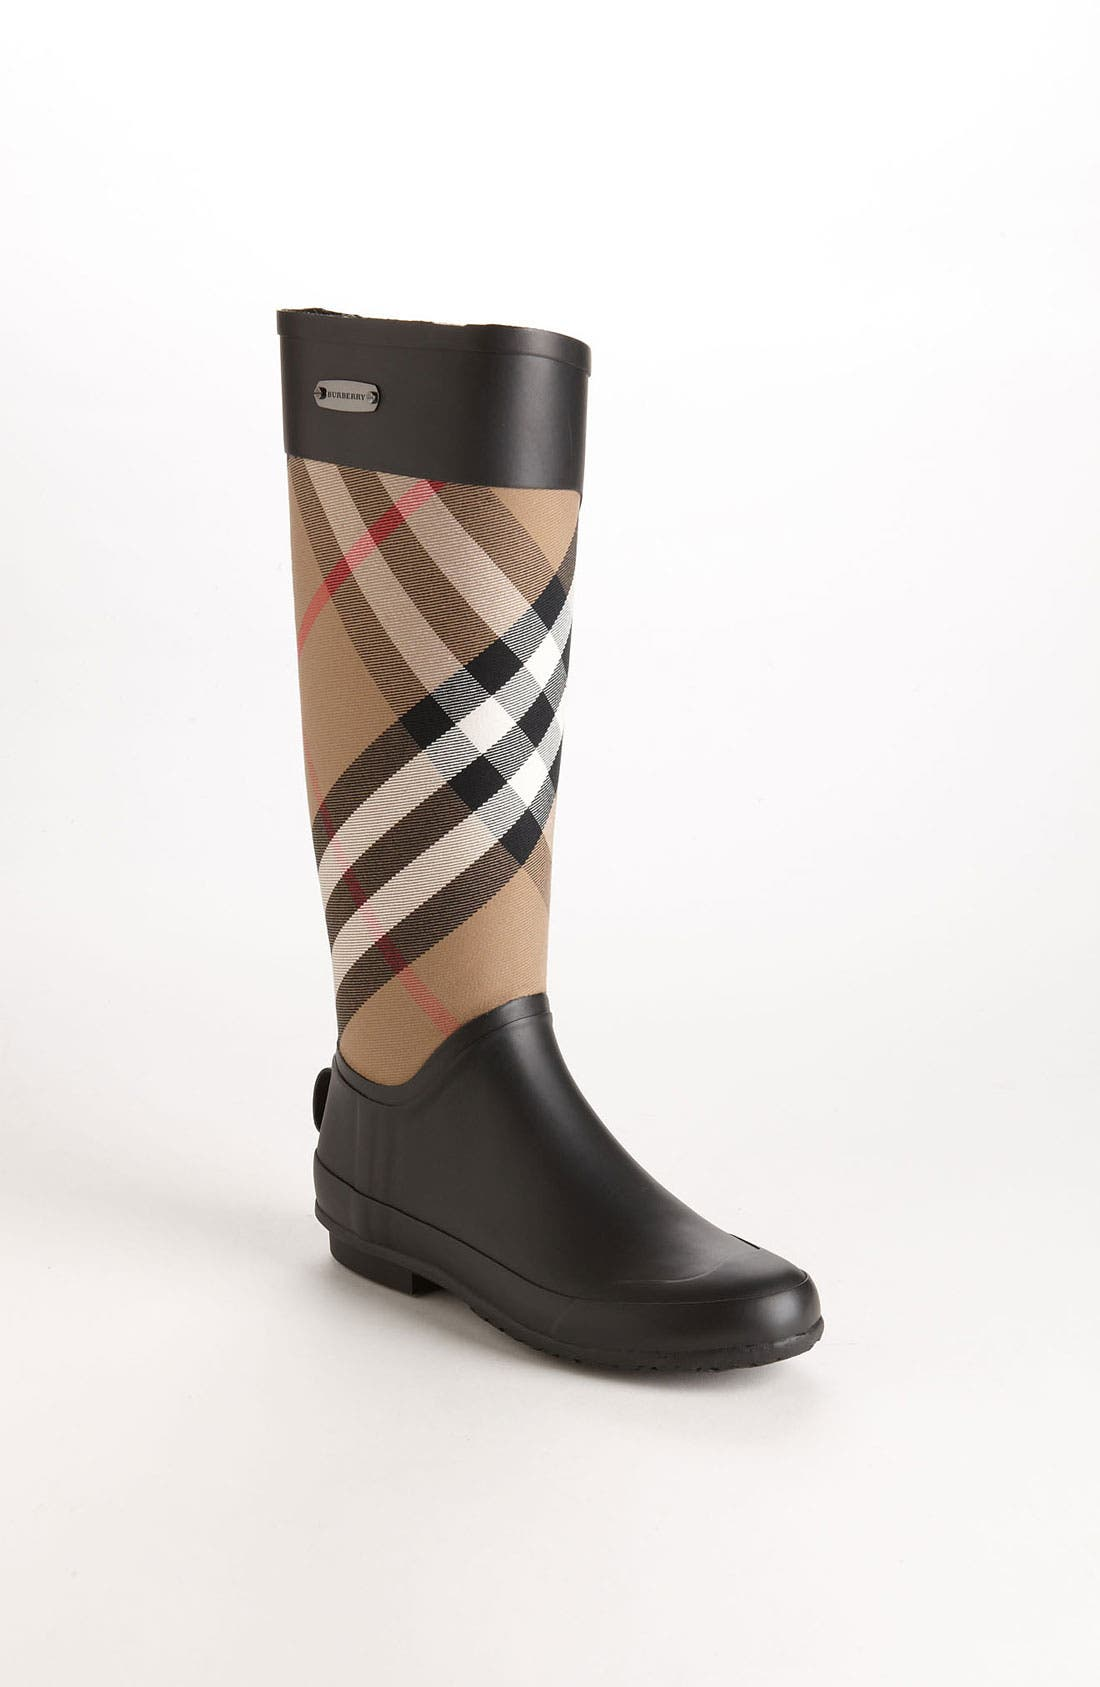 Alternate Image 1 Selected - Burberry Clemence Rain Boot (Women)